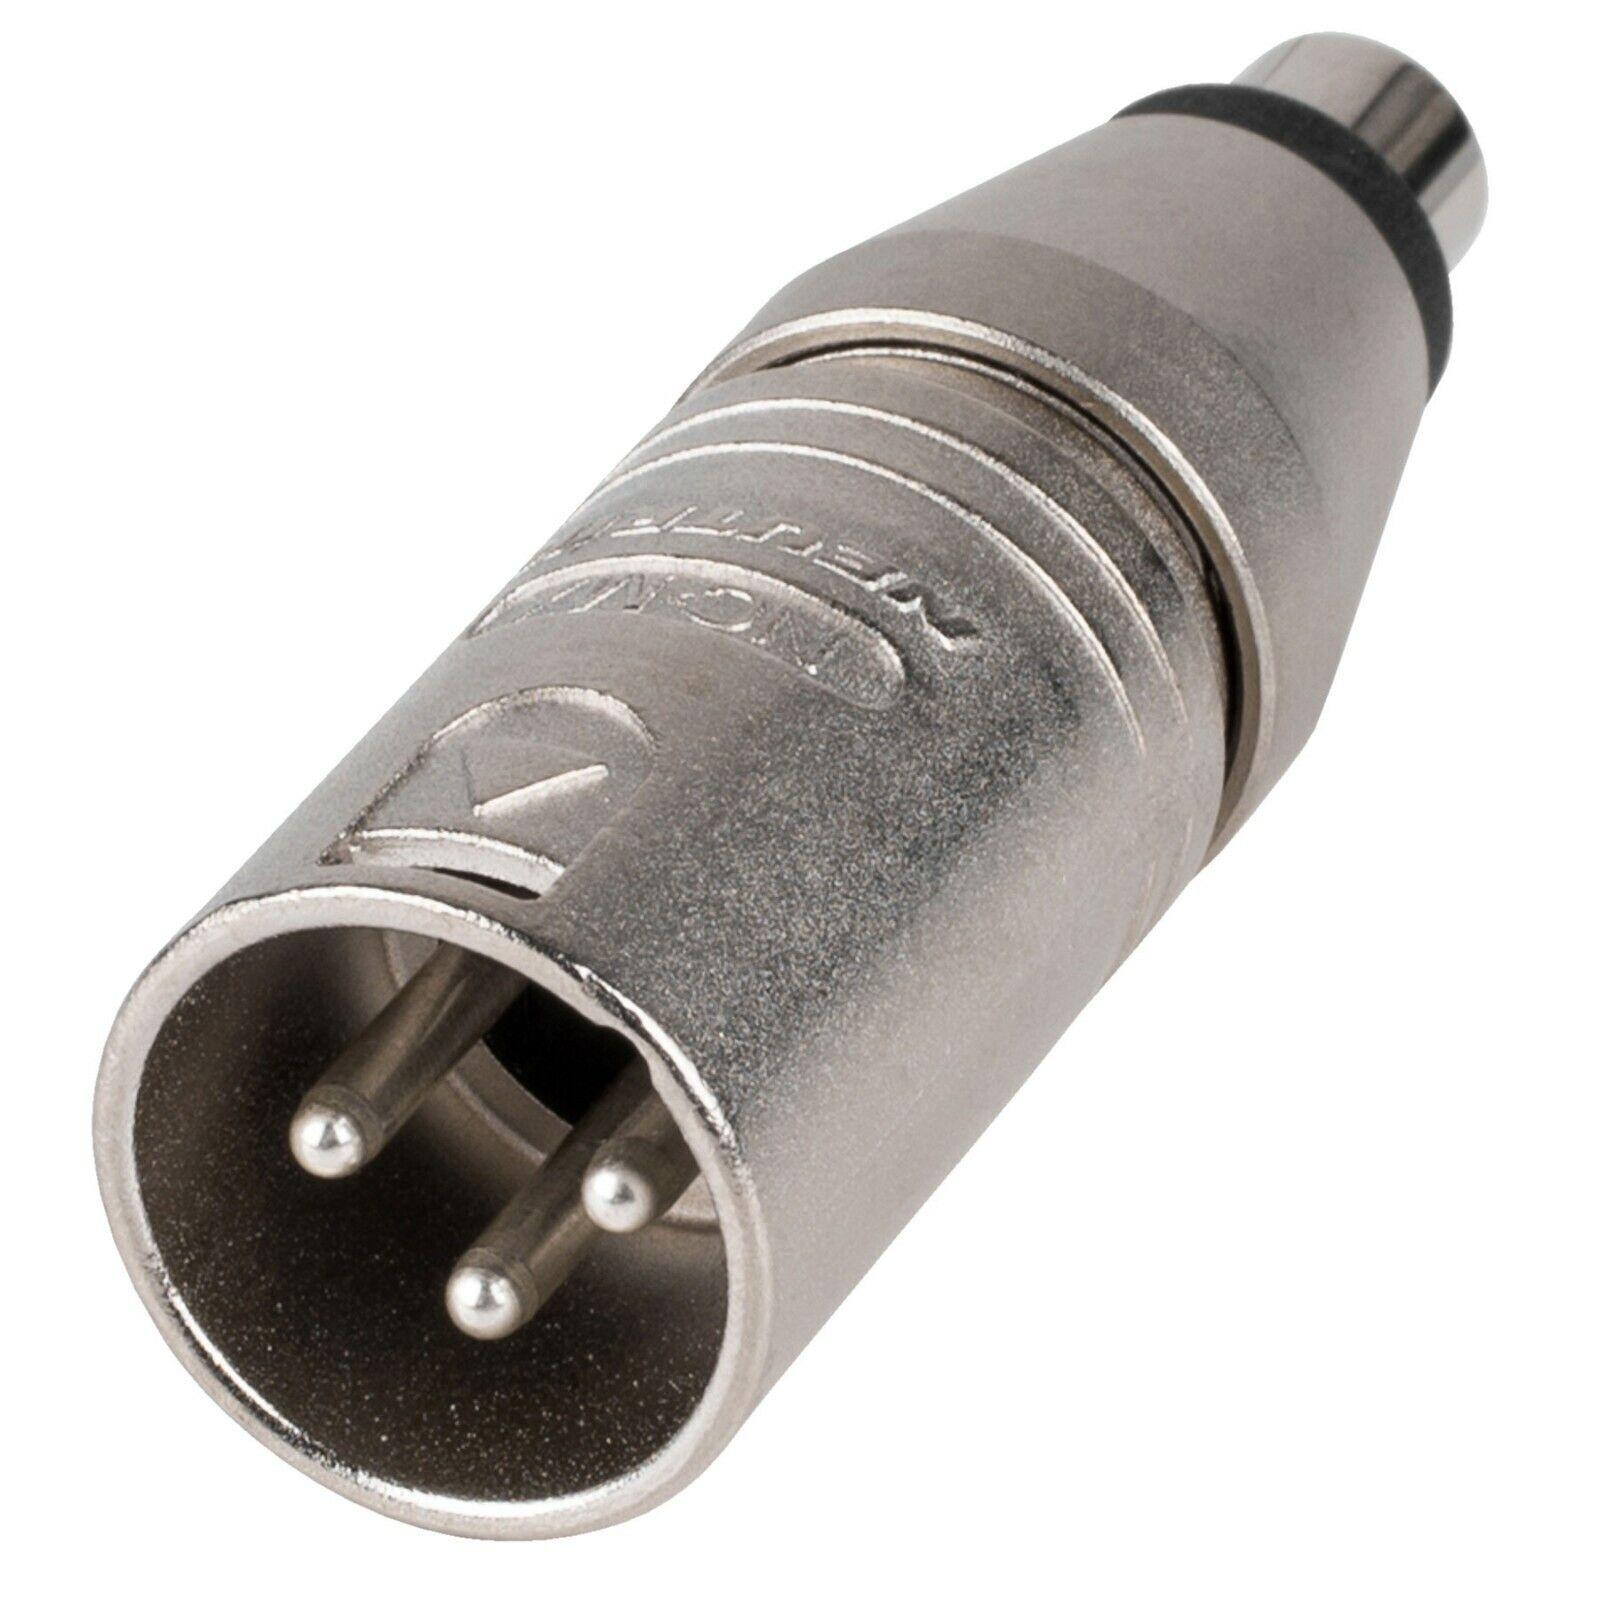 Neutrik 3 Pin Male XLR to Female RCA 1:1 Impedance Matcher NA2MPMF